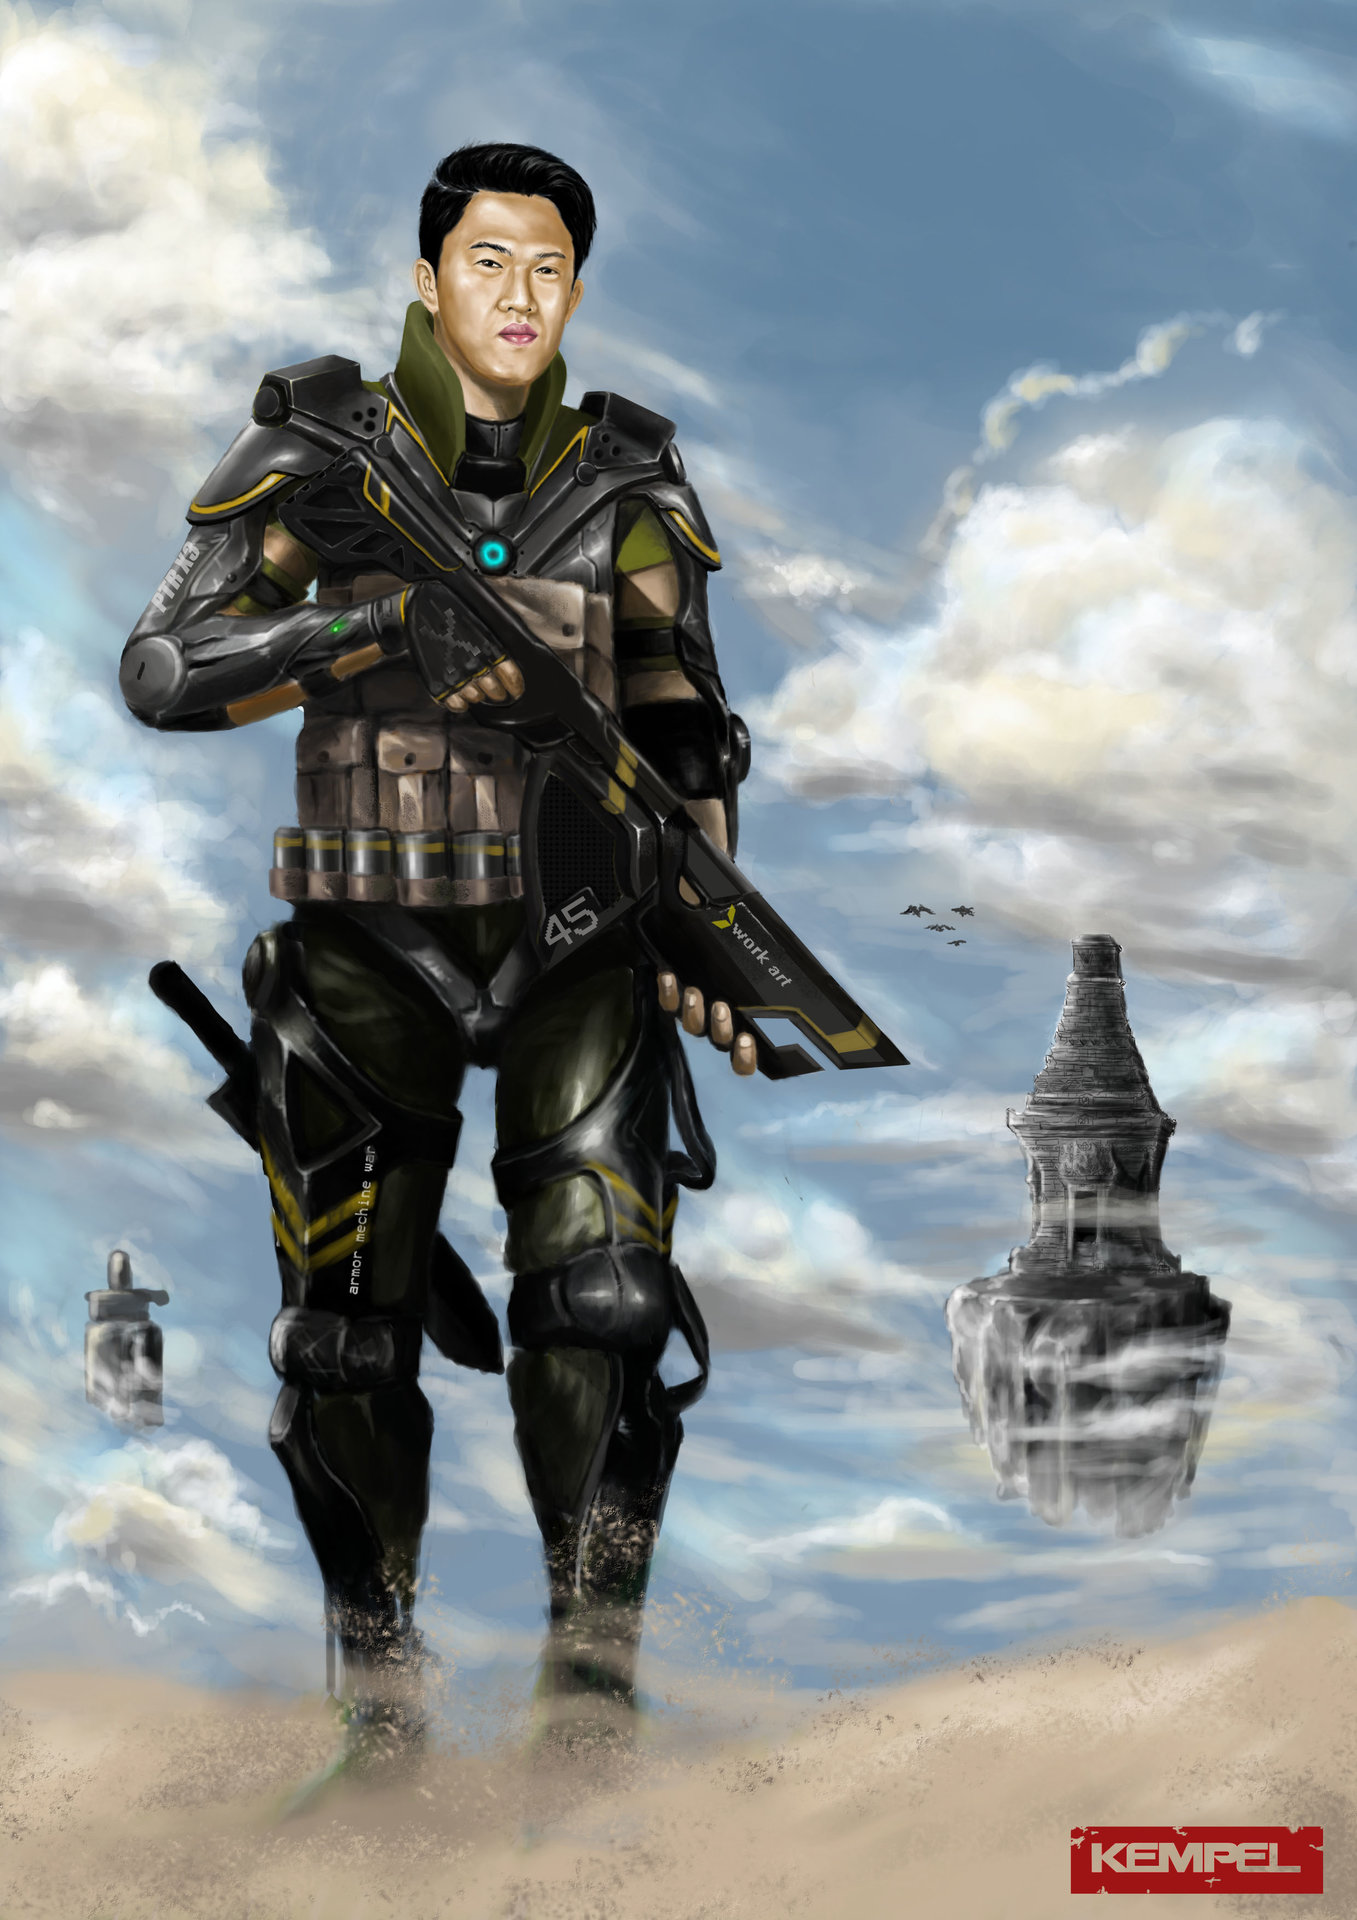 Taufiqurrahman hidayat piter armor